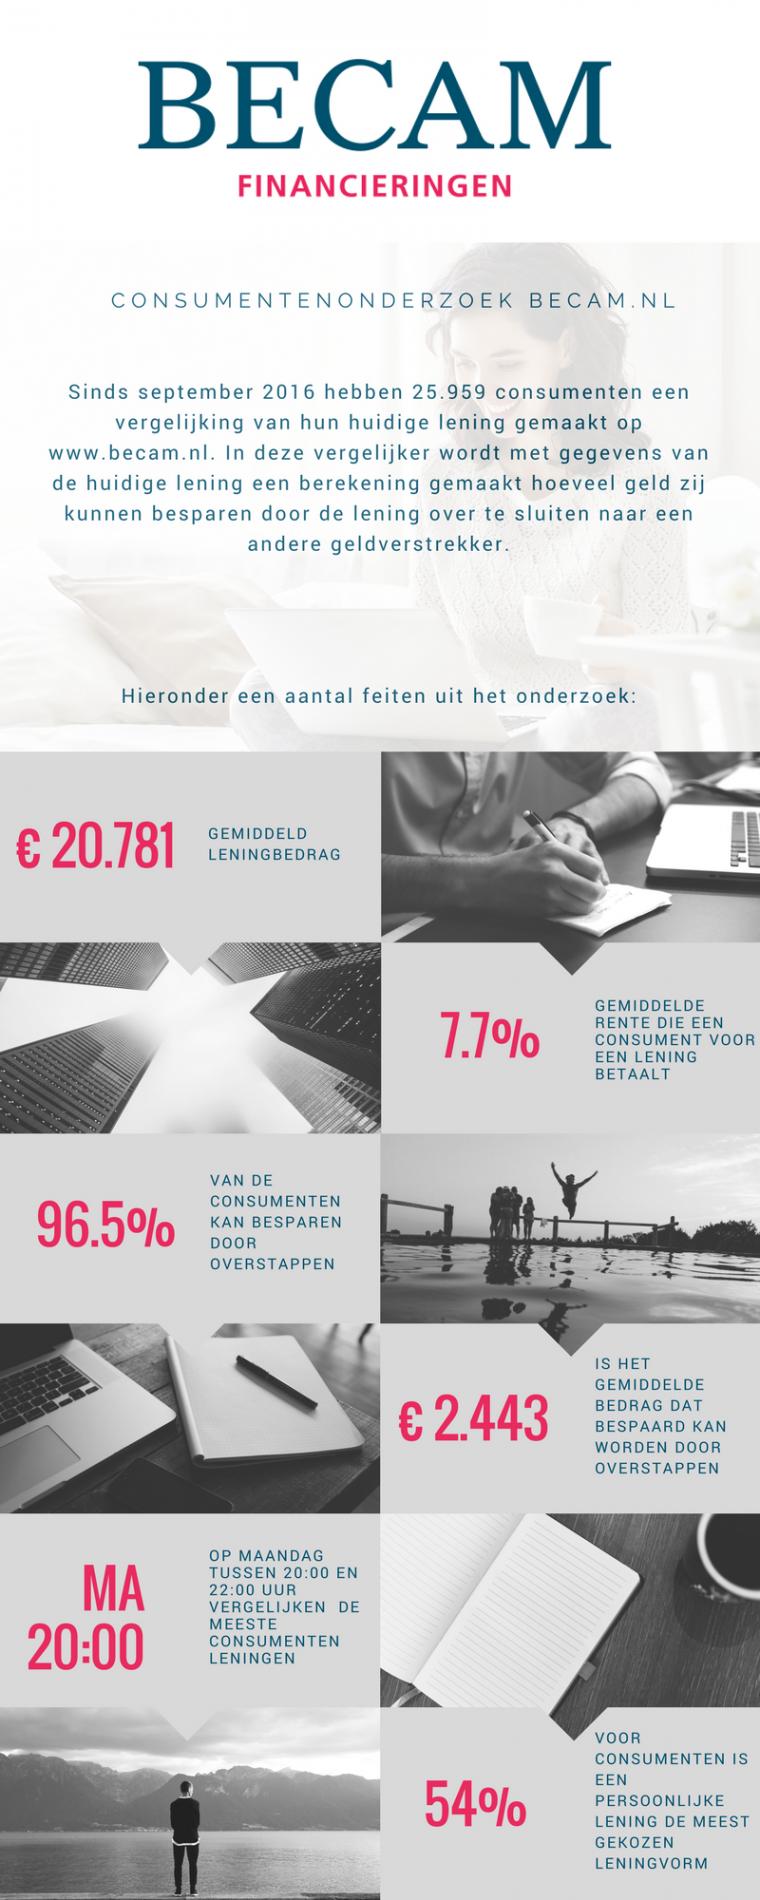 Consumentenonderzoek Becam.nl